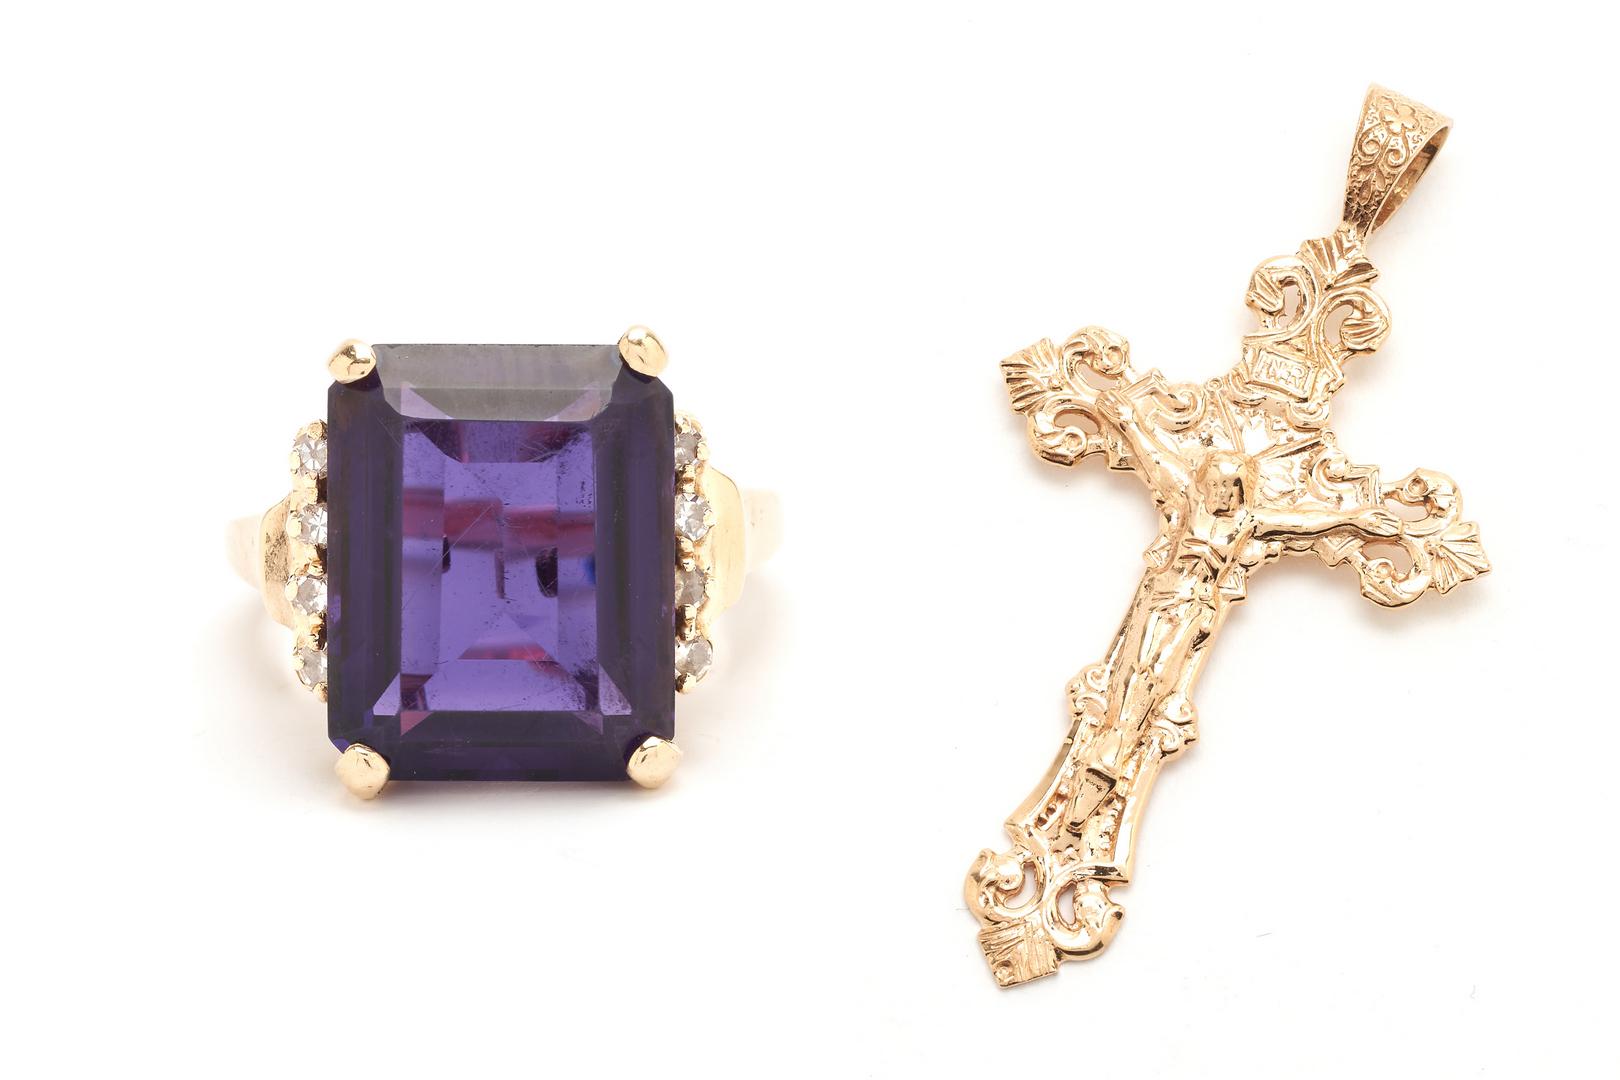 Lot 1209: Ladies 14K and 8 Carat Amethyst Ring & 14K Crucifix